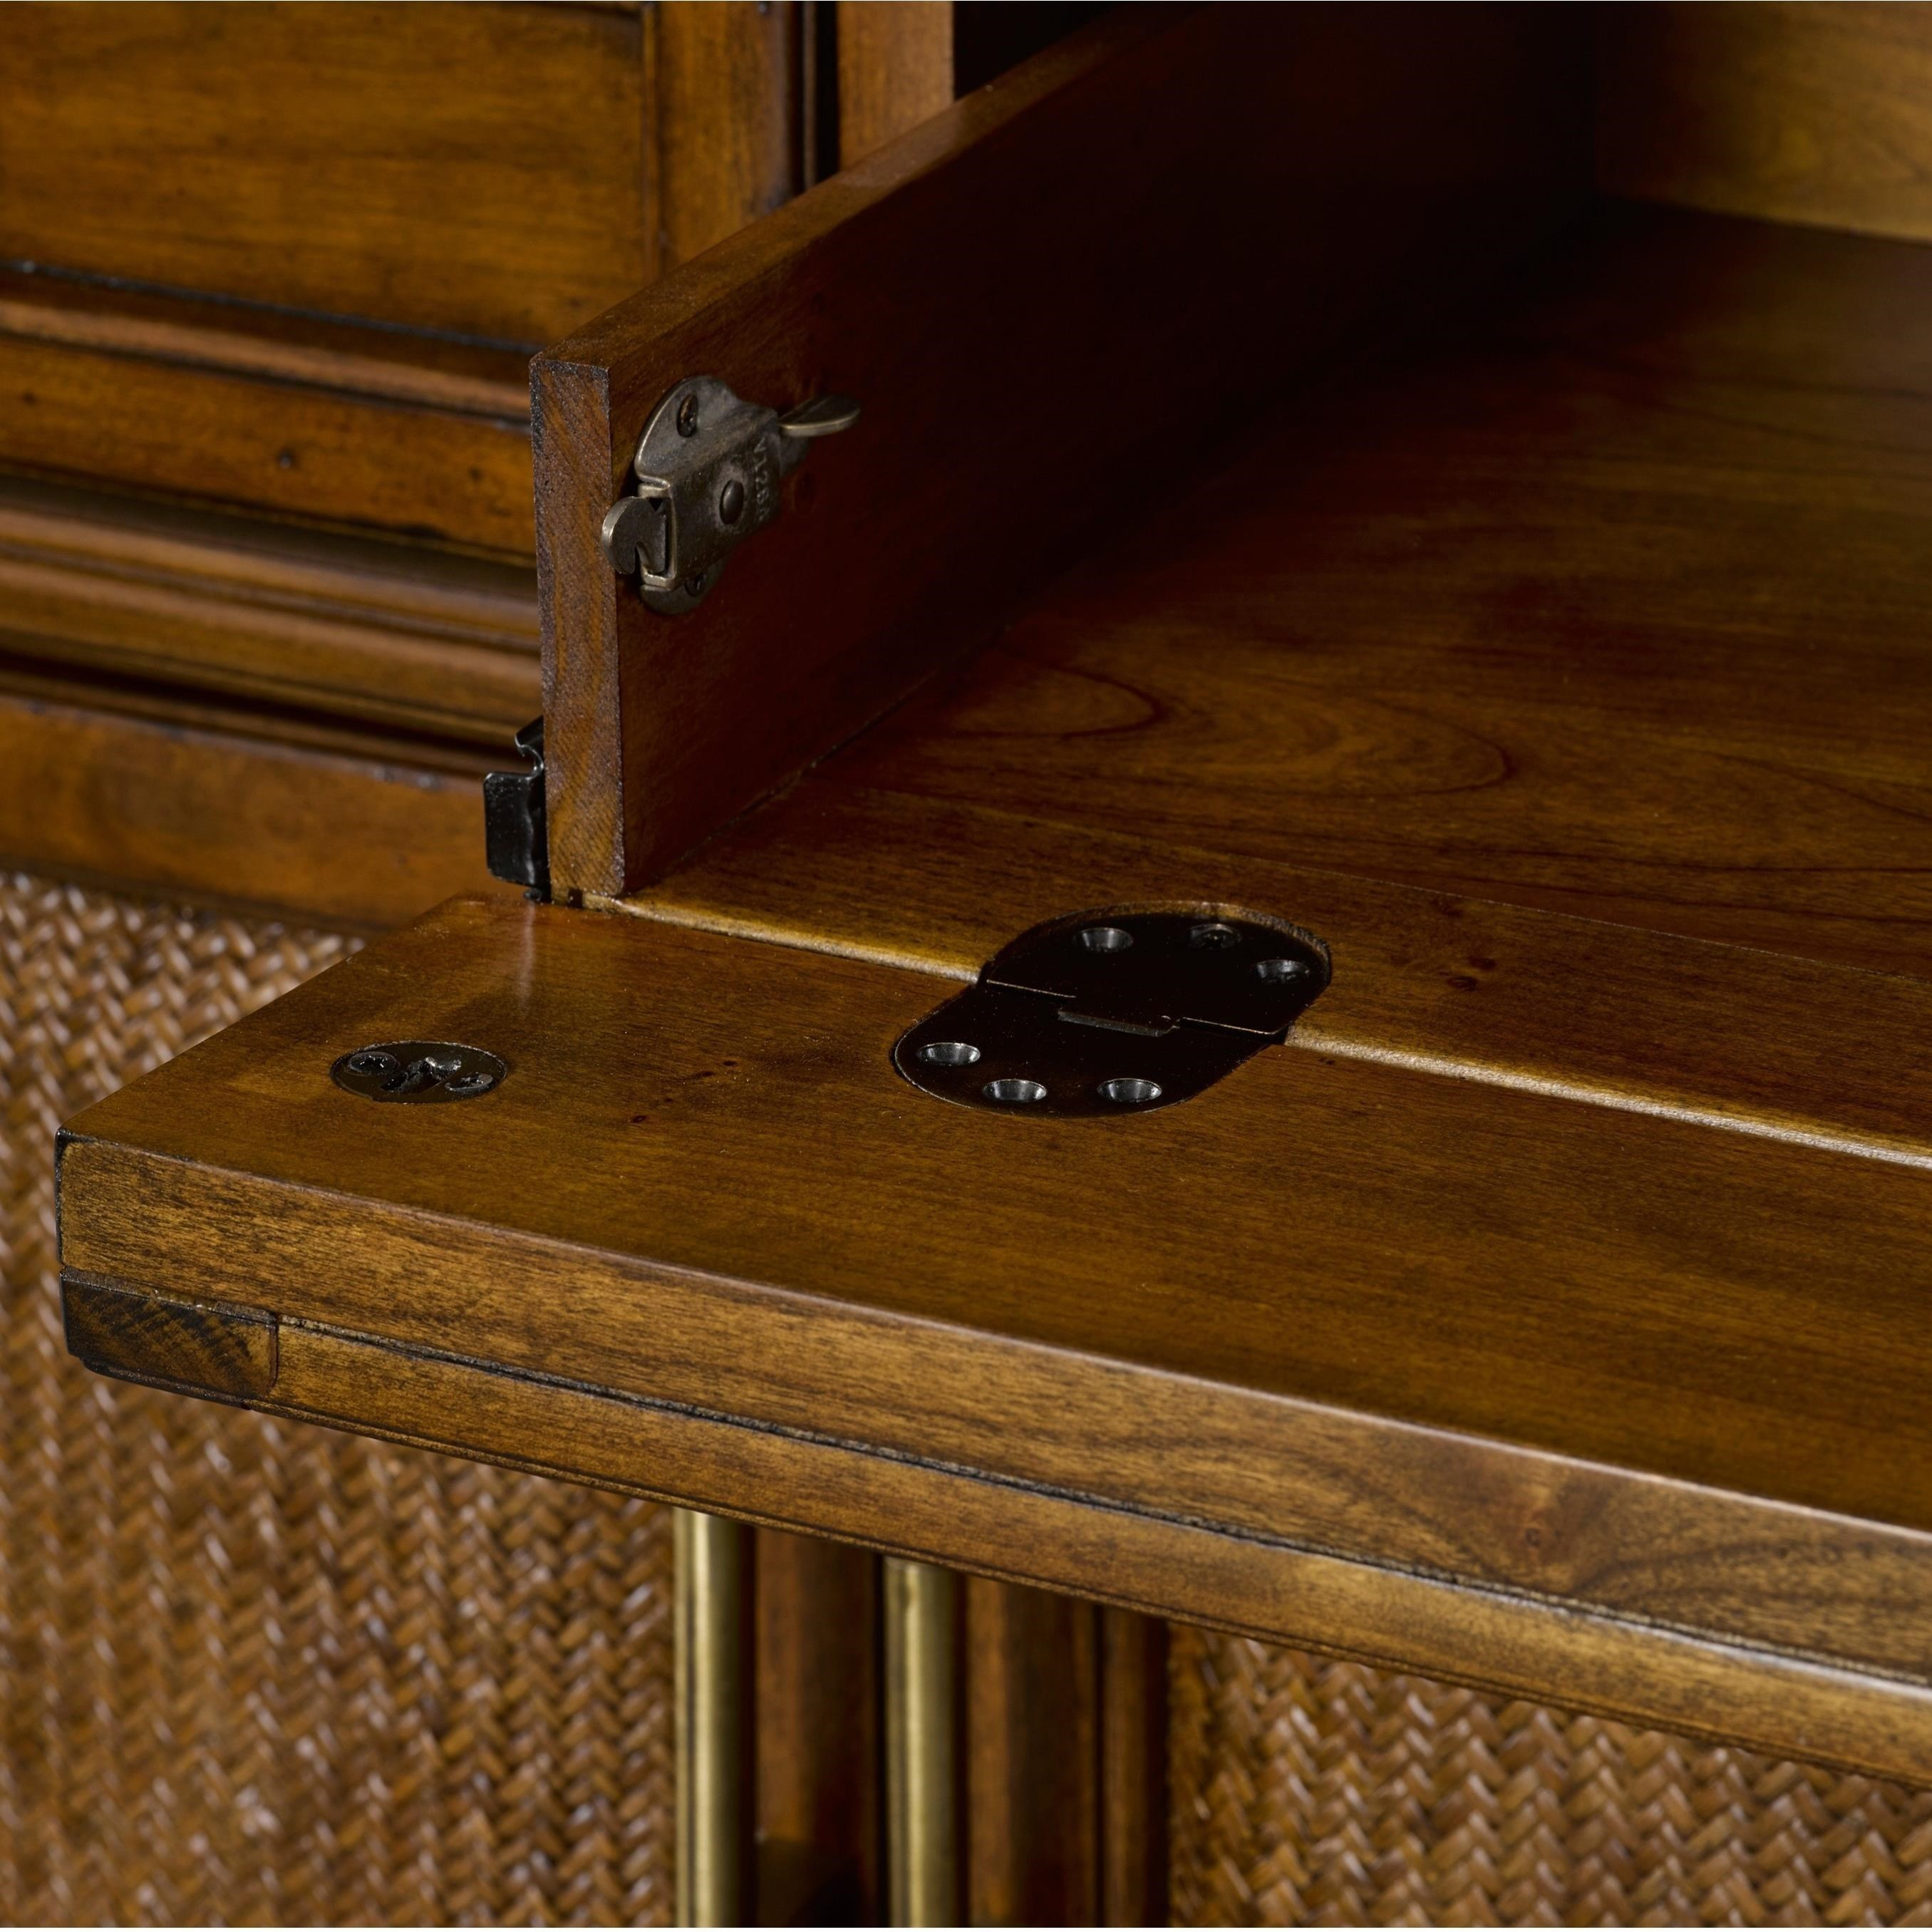 Broyhill Furniture Amalie Bay 4548 513 5 Drawer Sideboard